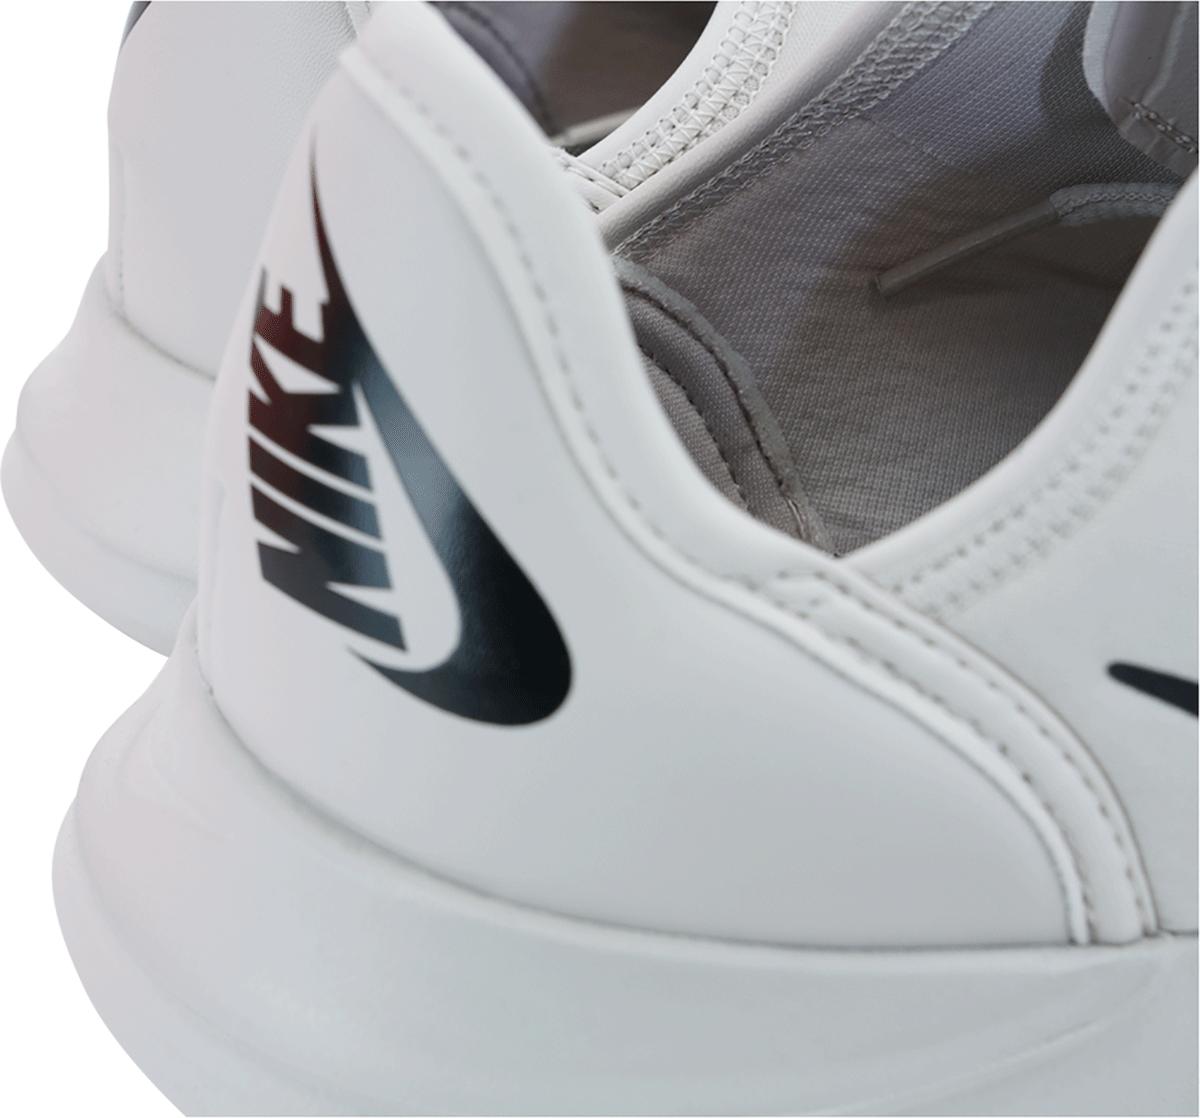 Nike-Men-039-s-Hakata-Running-Shoes thumbnail 18